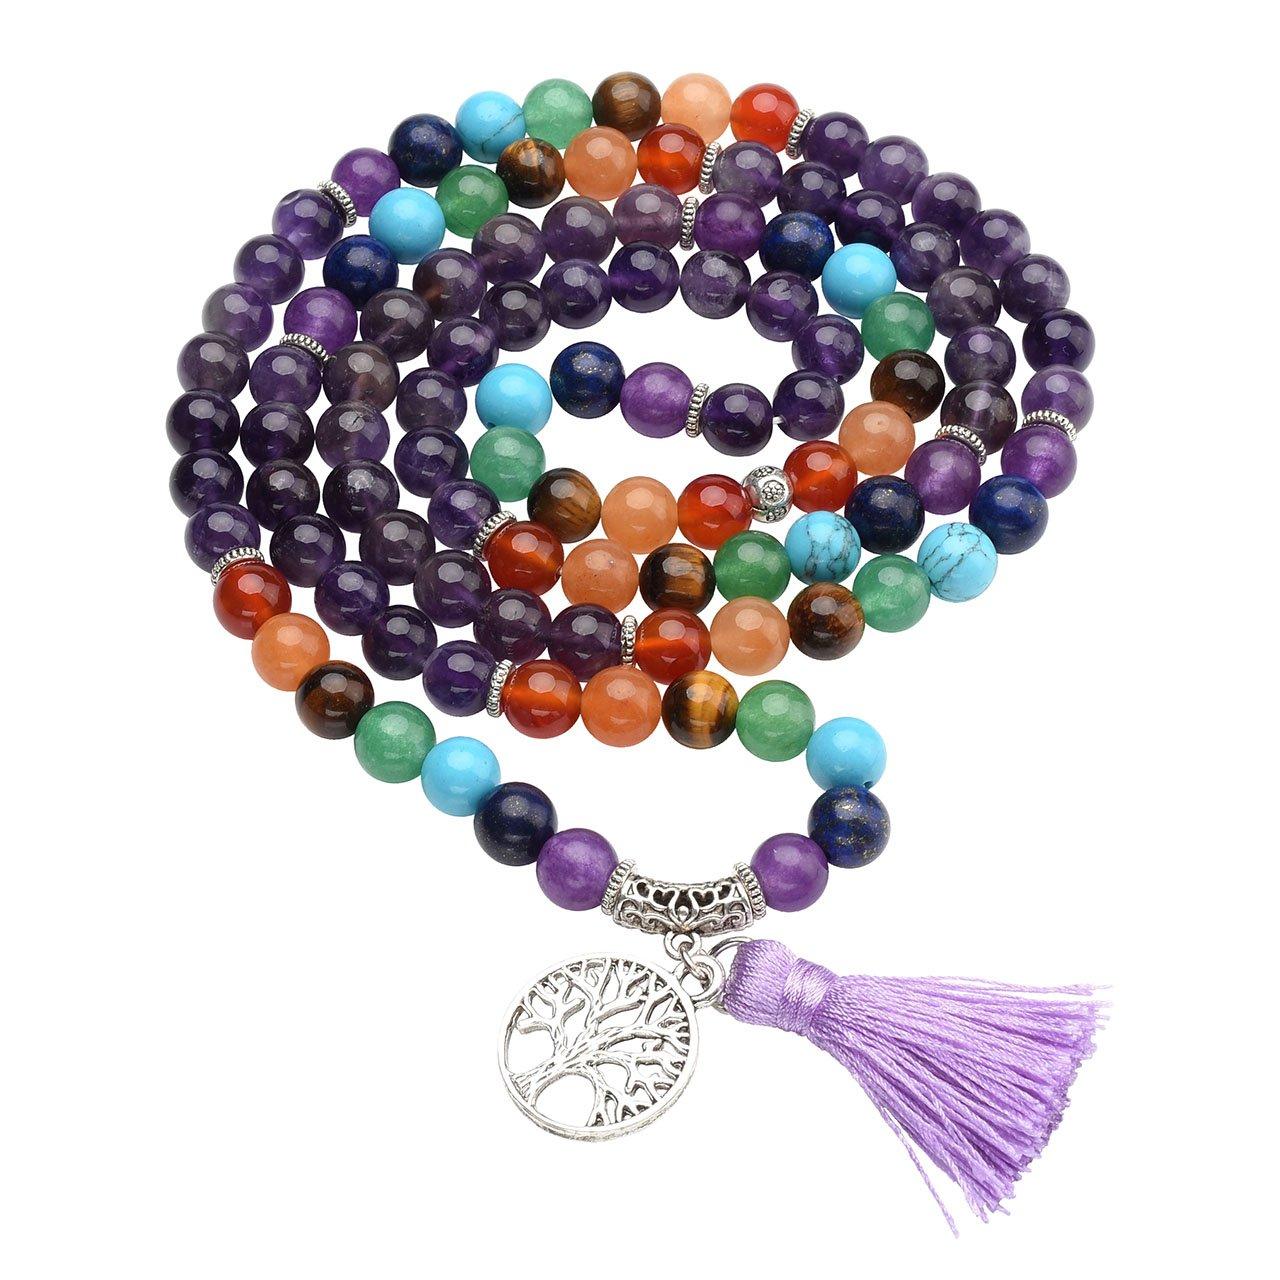 Top Plaza 7 Chakra Buddhist Mala Prayer Beads 108 Meditation Healing Multilayer Bracelet/Necklace W/Tree of Life Tassel Charm (Amethyst)